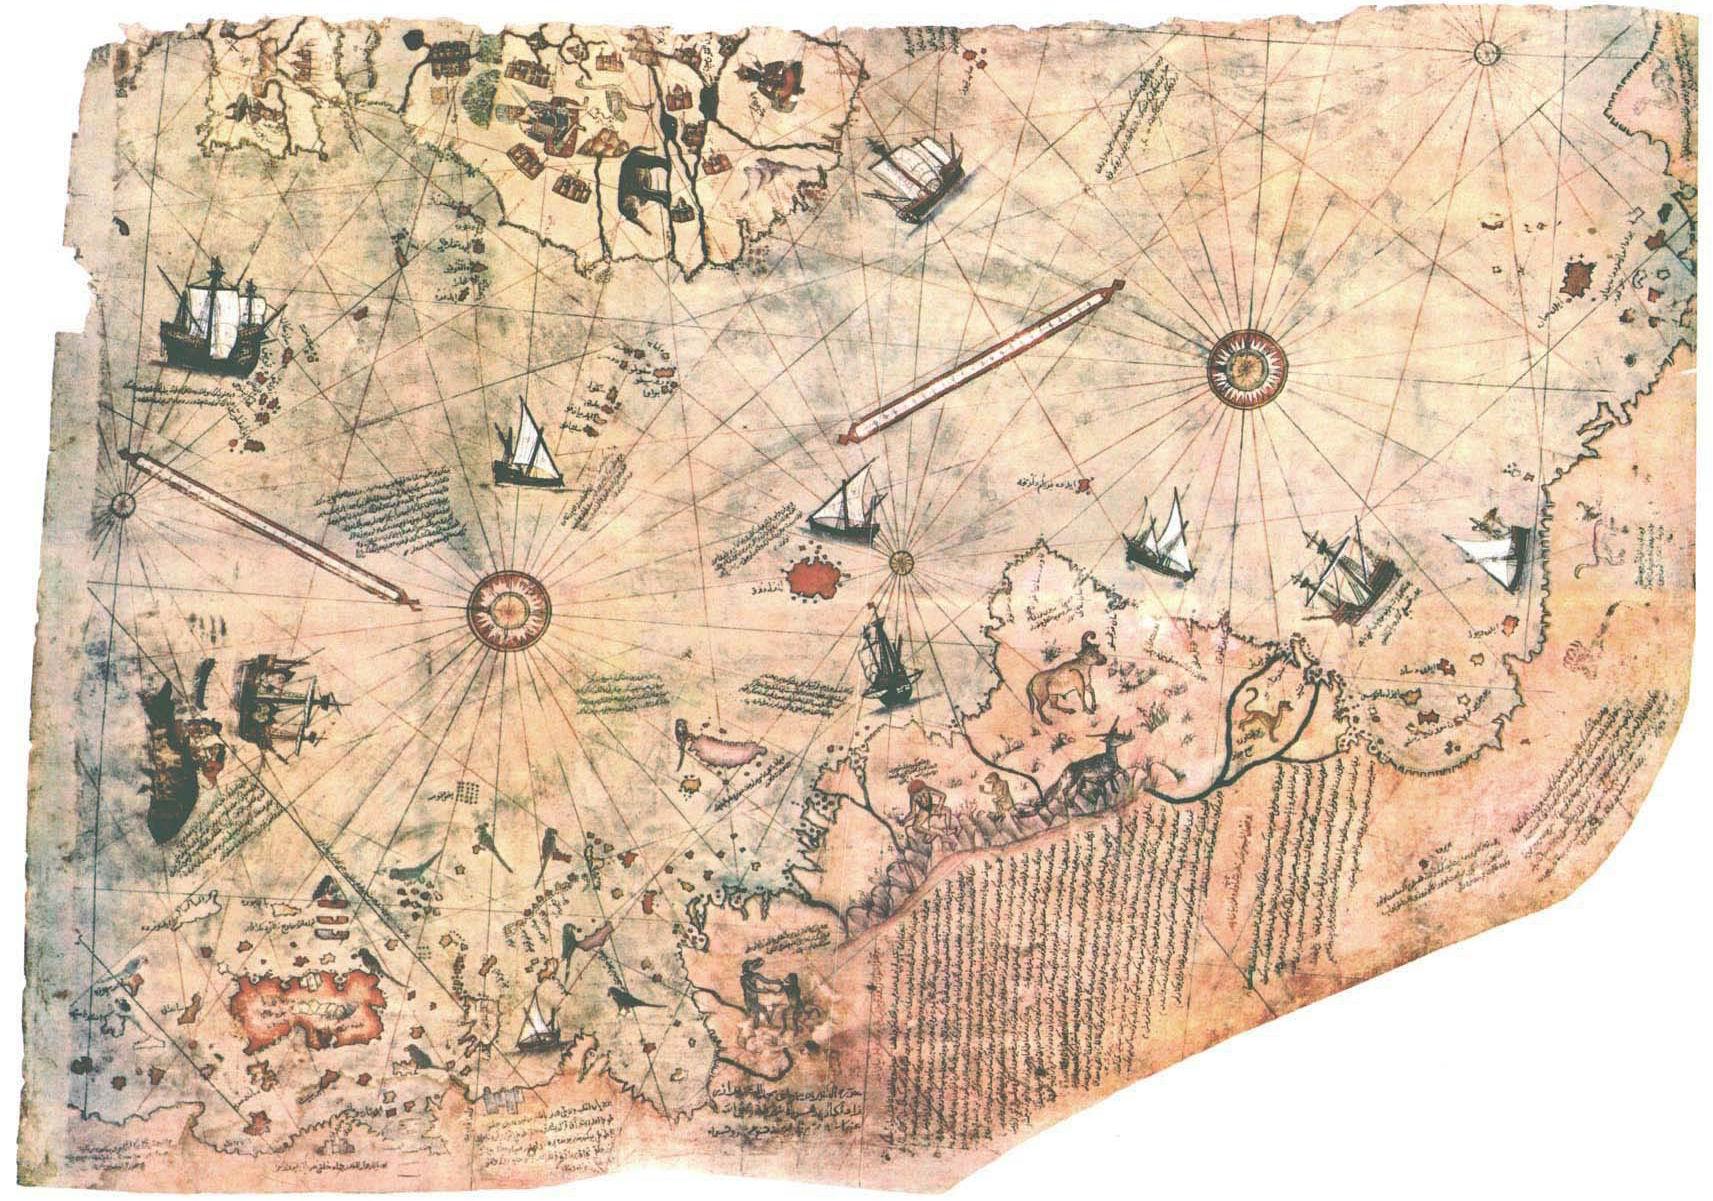 the-piri-reis-map-of-world-in-1513